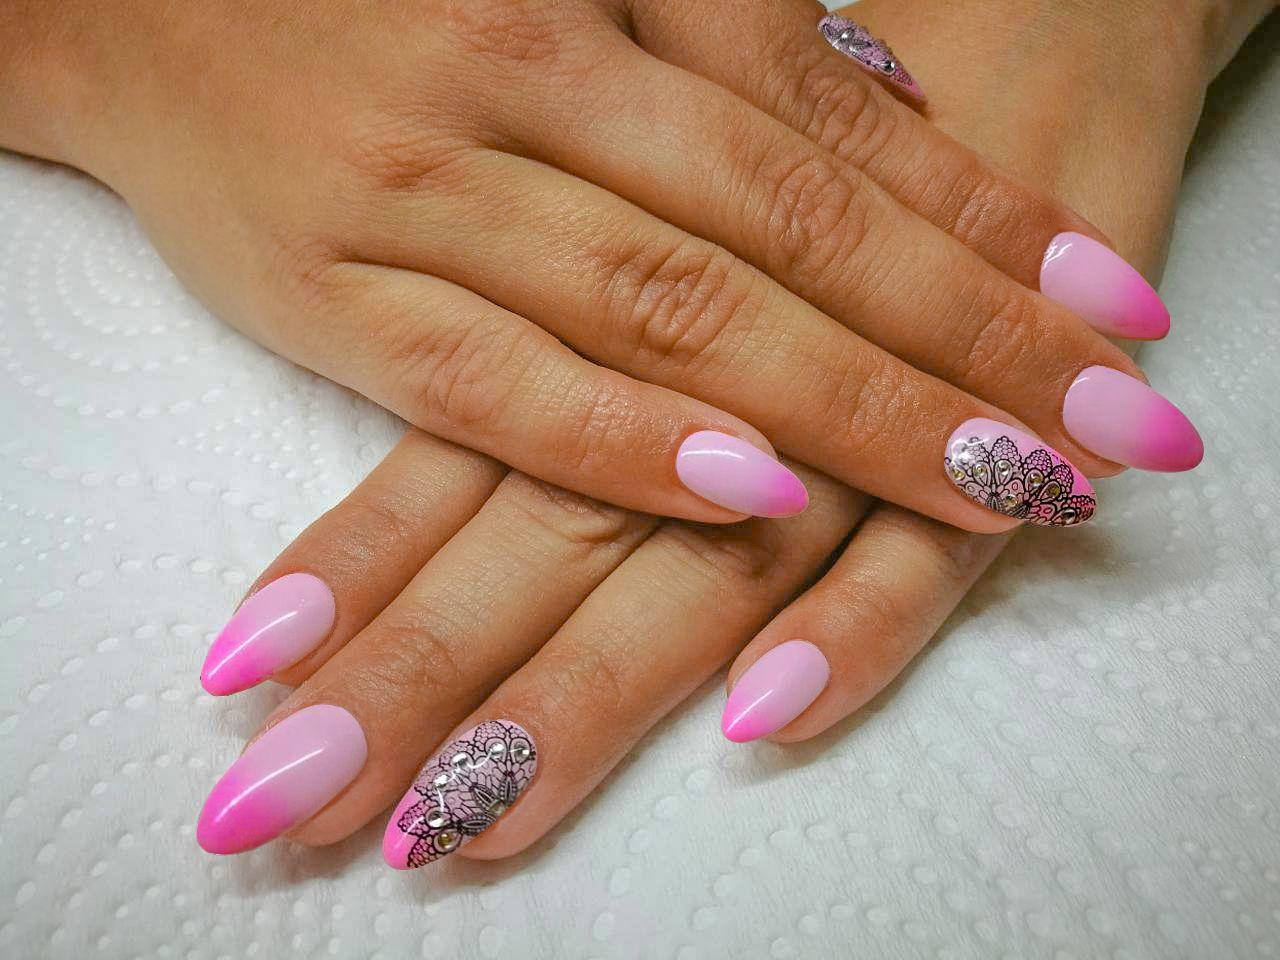 Jemna Krajka A Fantasticke Ombre Vytvorene Gel Laky Neonail Thermo Color Takove Proste Chcete Pink Ombre Lace Manicure Nails Nailar Color Nails Gel